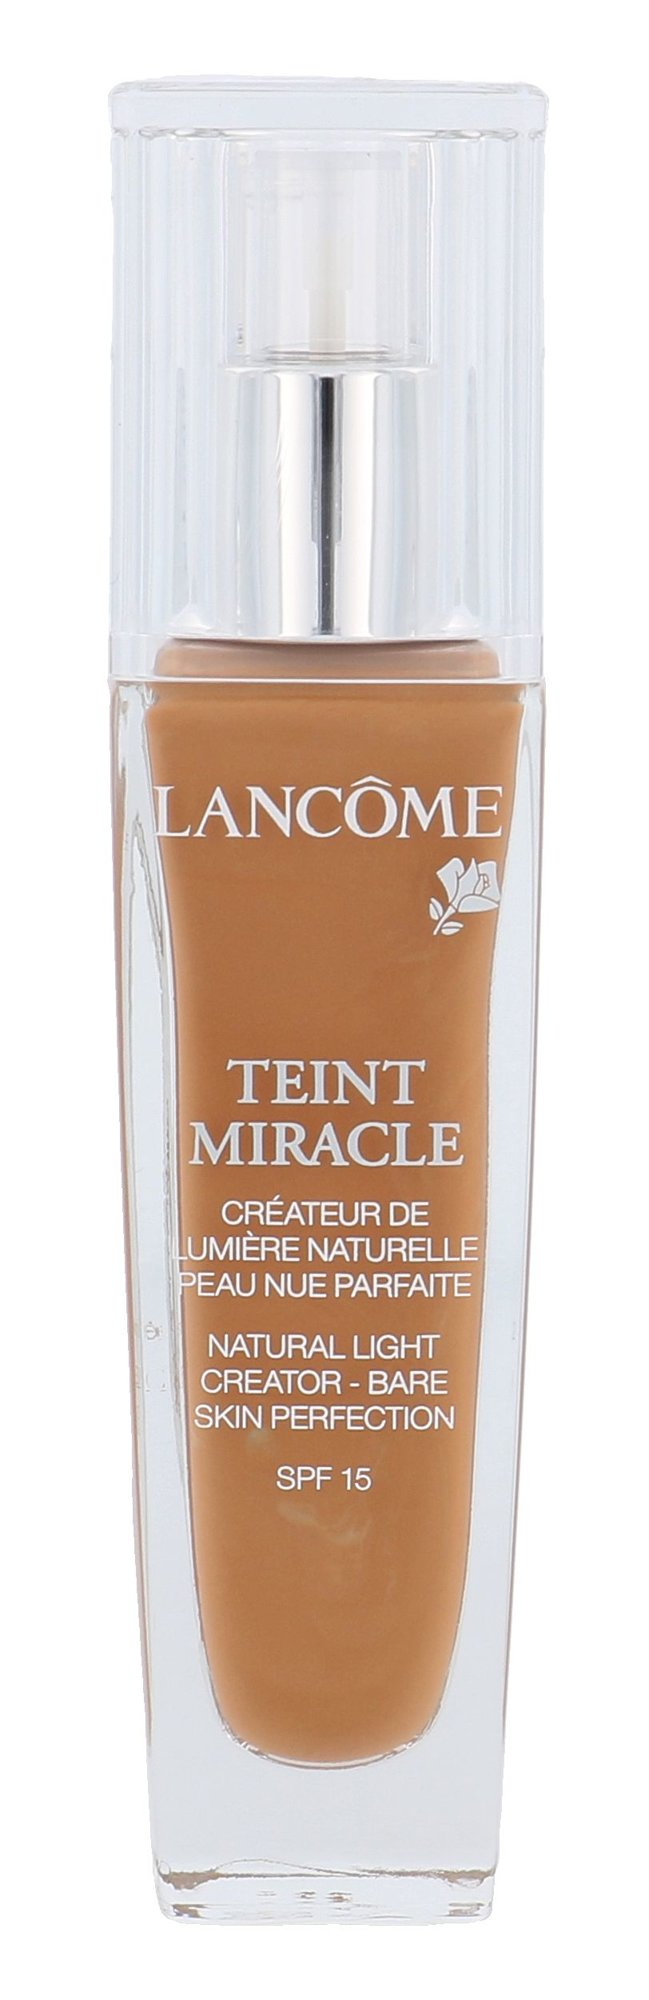 Lancôme Teint Miracle Cosmetic 30ml 06 Beige Cannelle